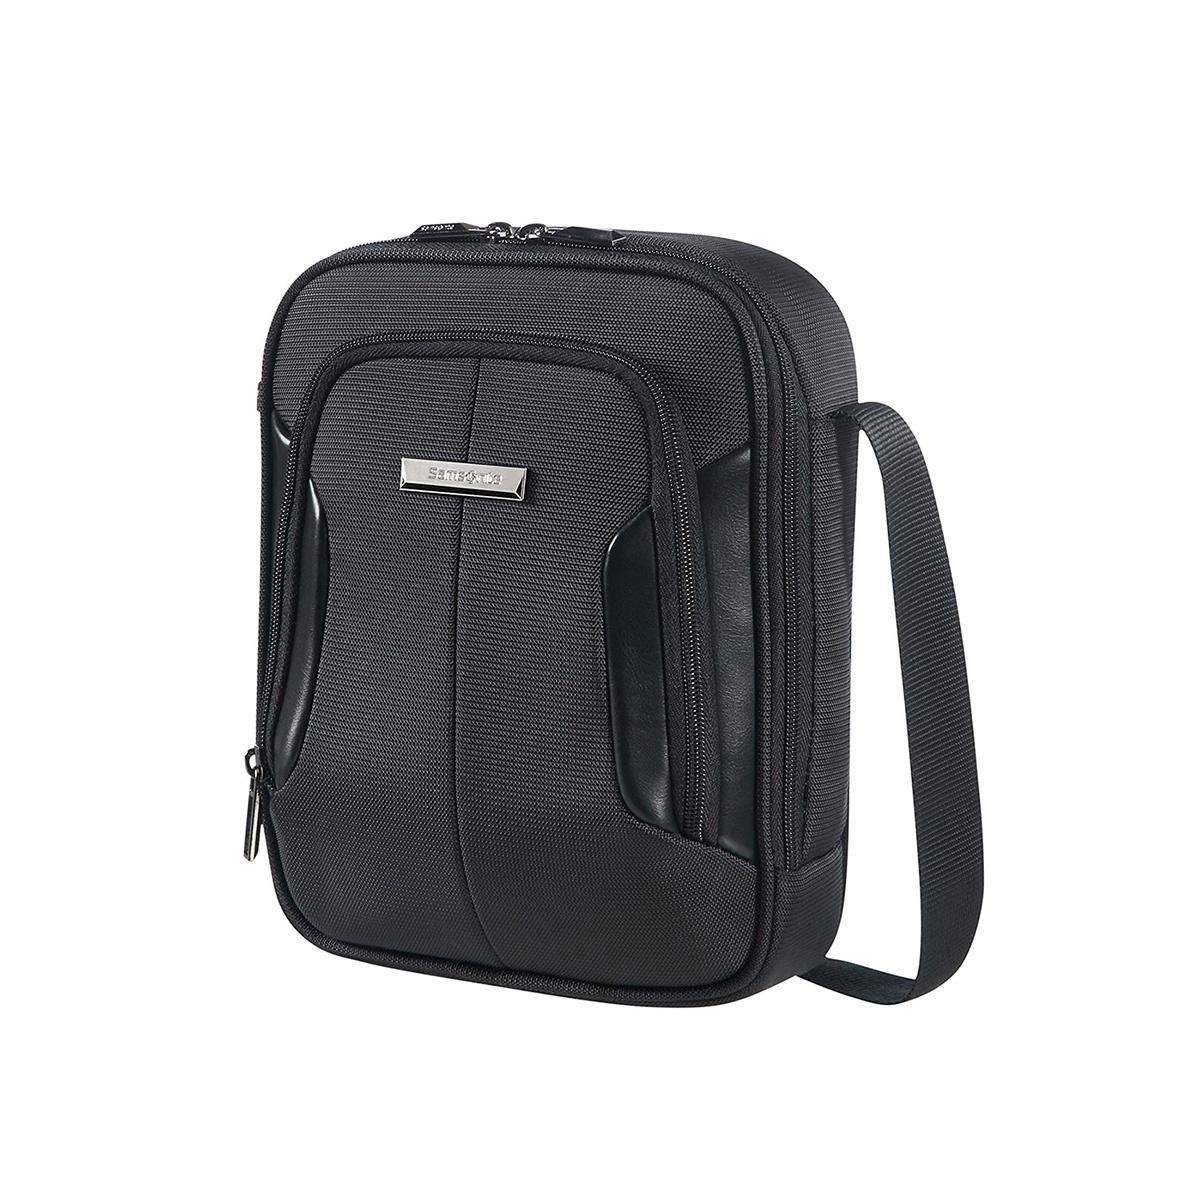 SAMSONITE 75213 Μαύρη Τσάντα Ώμου-Χιαστί